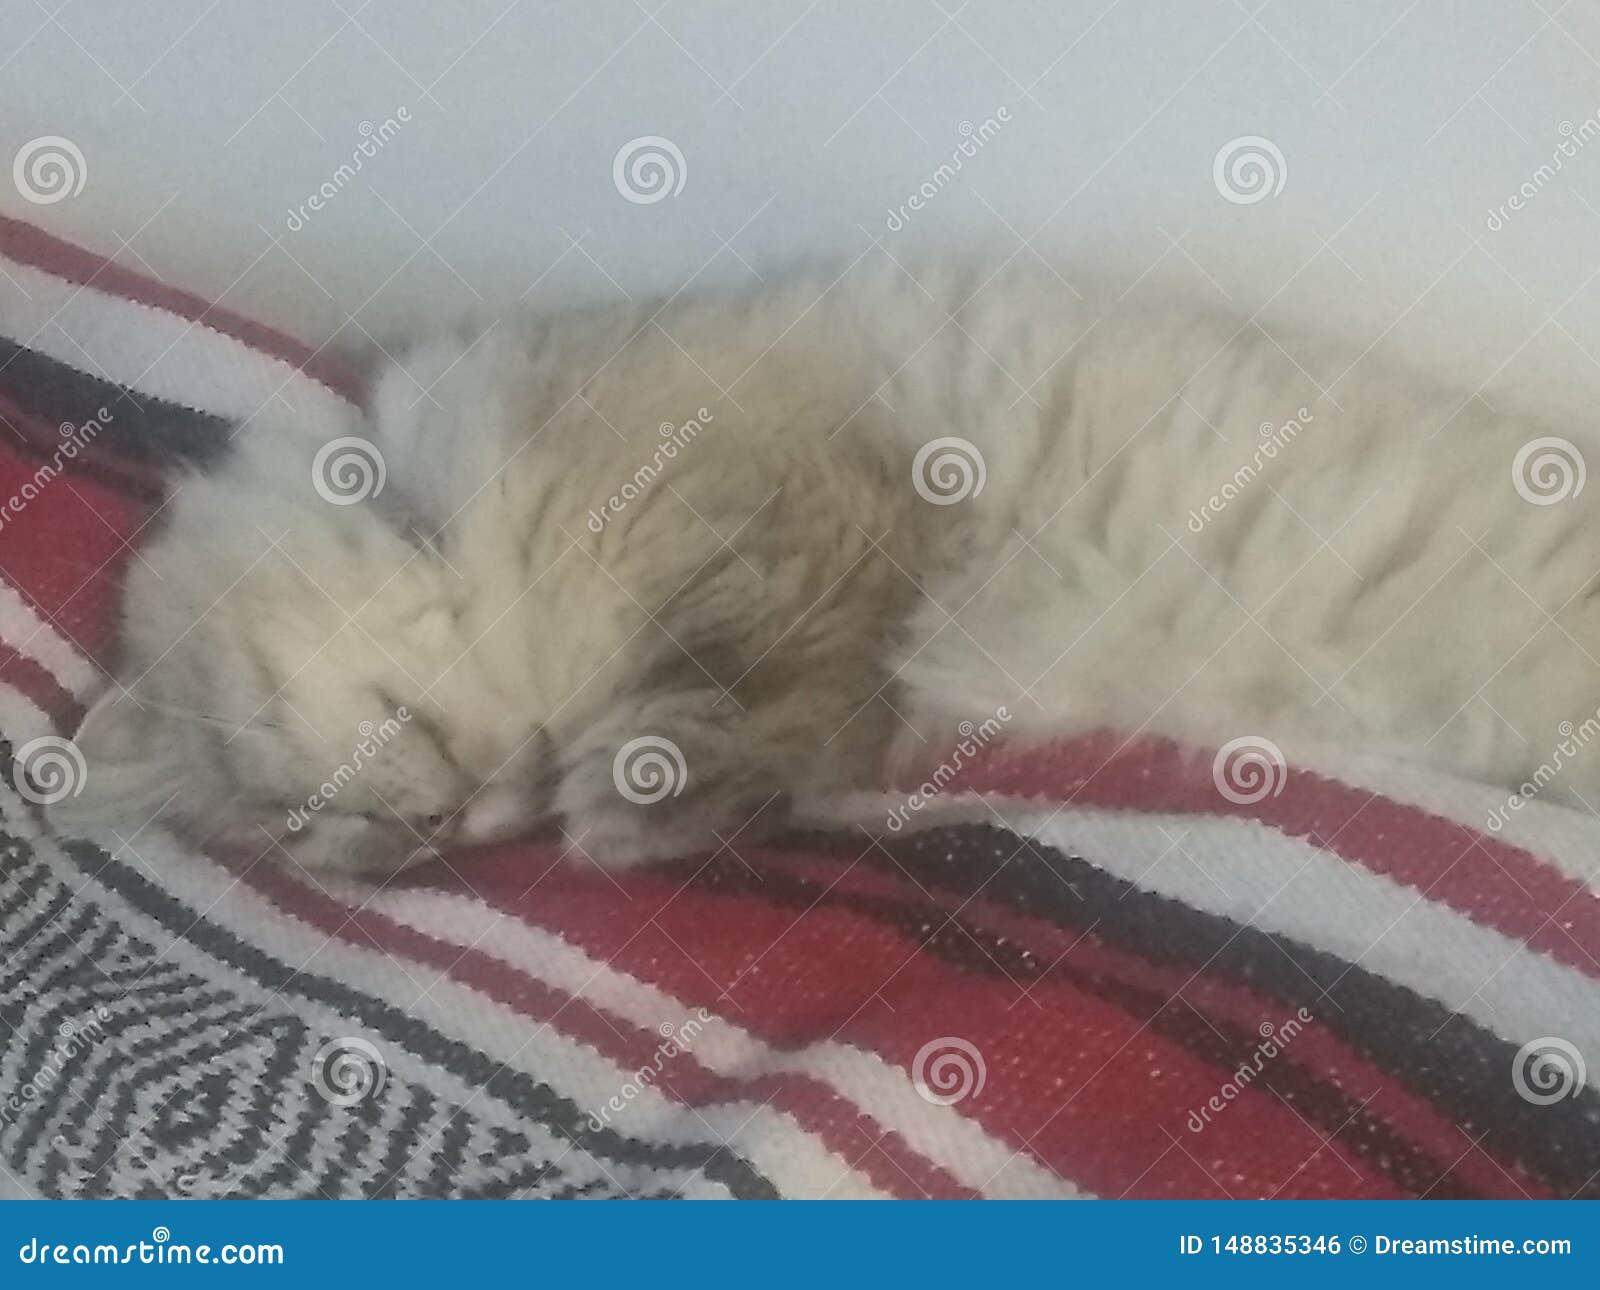 Kitty somnolent